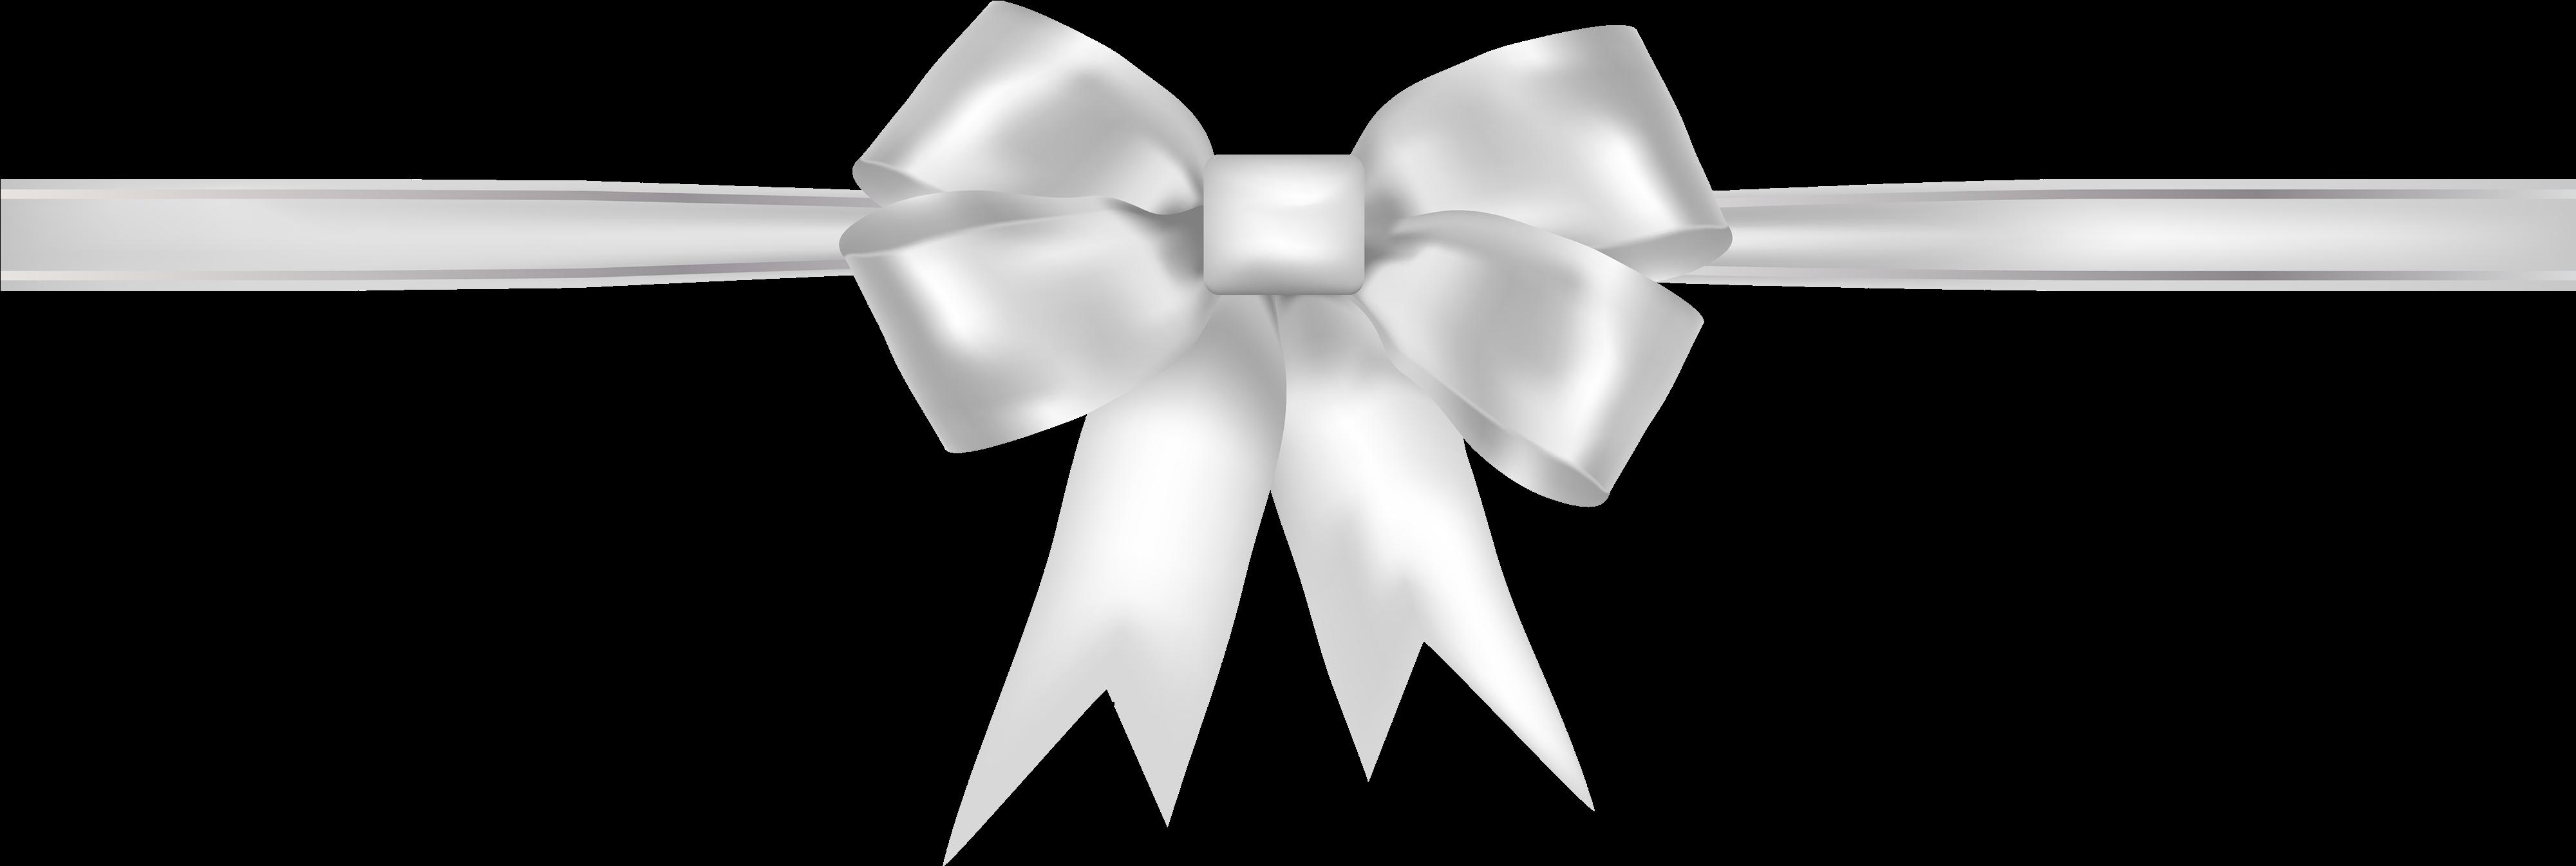 White Ribbon Png Clipart.